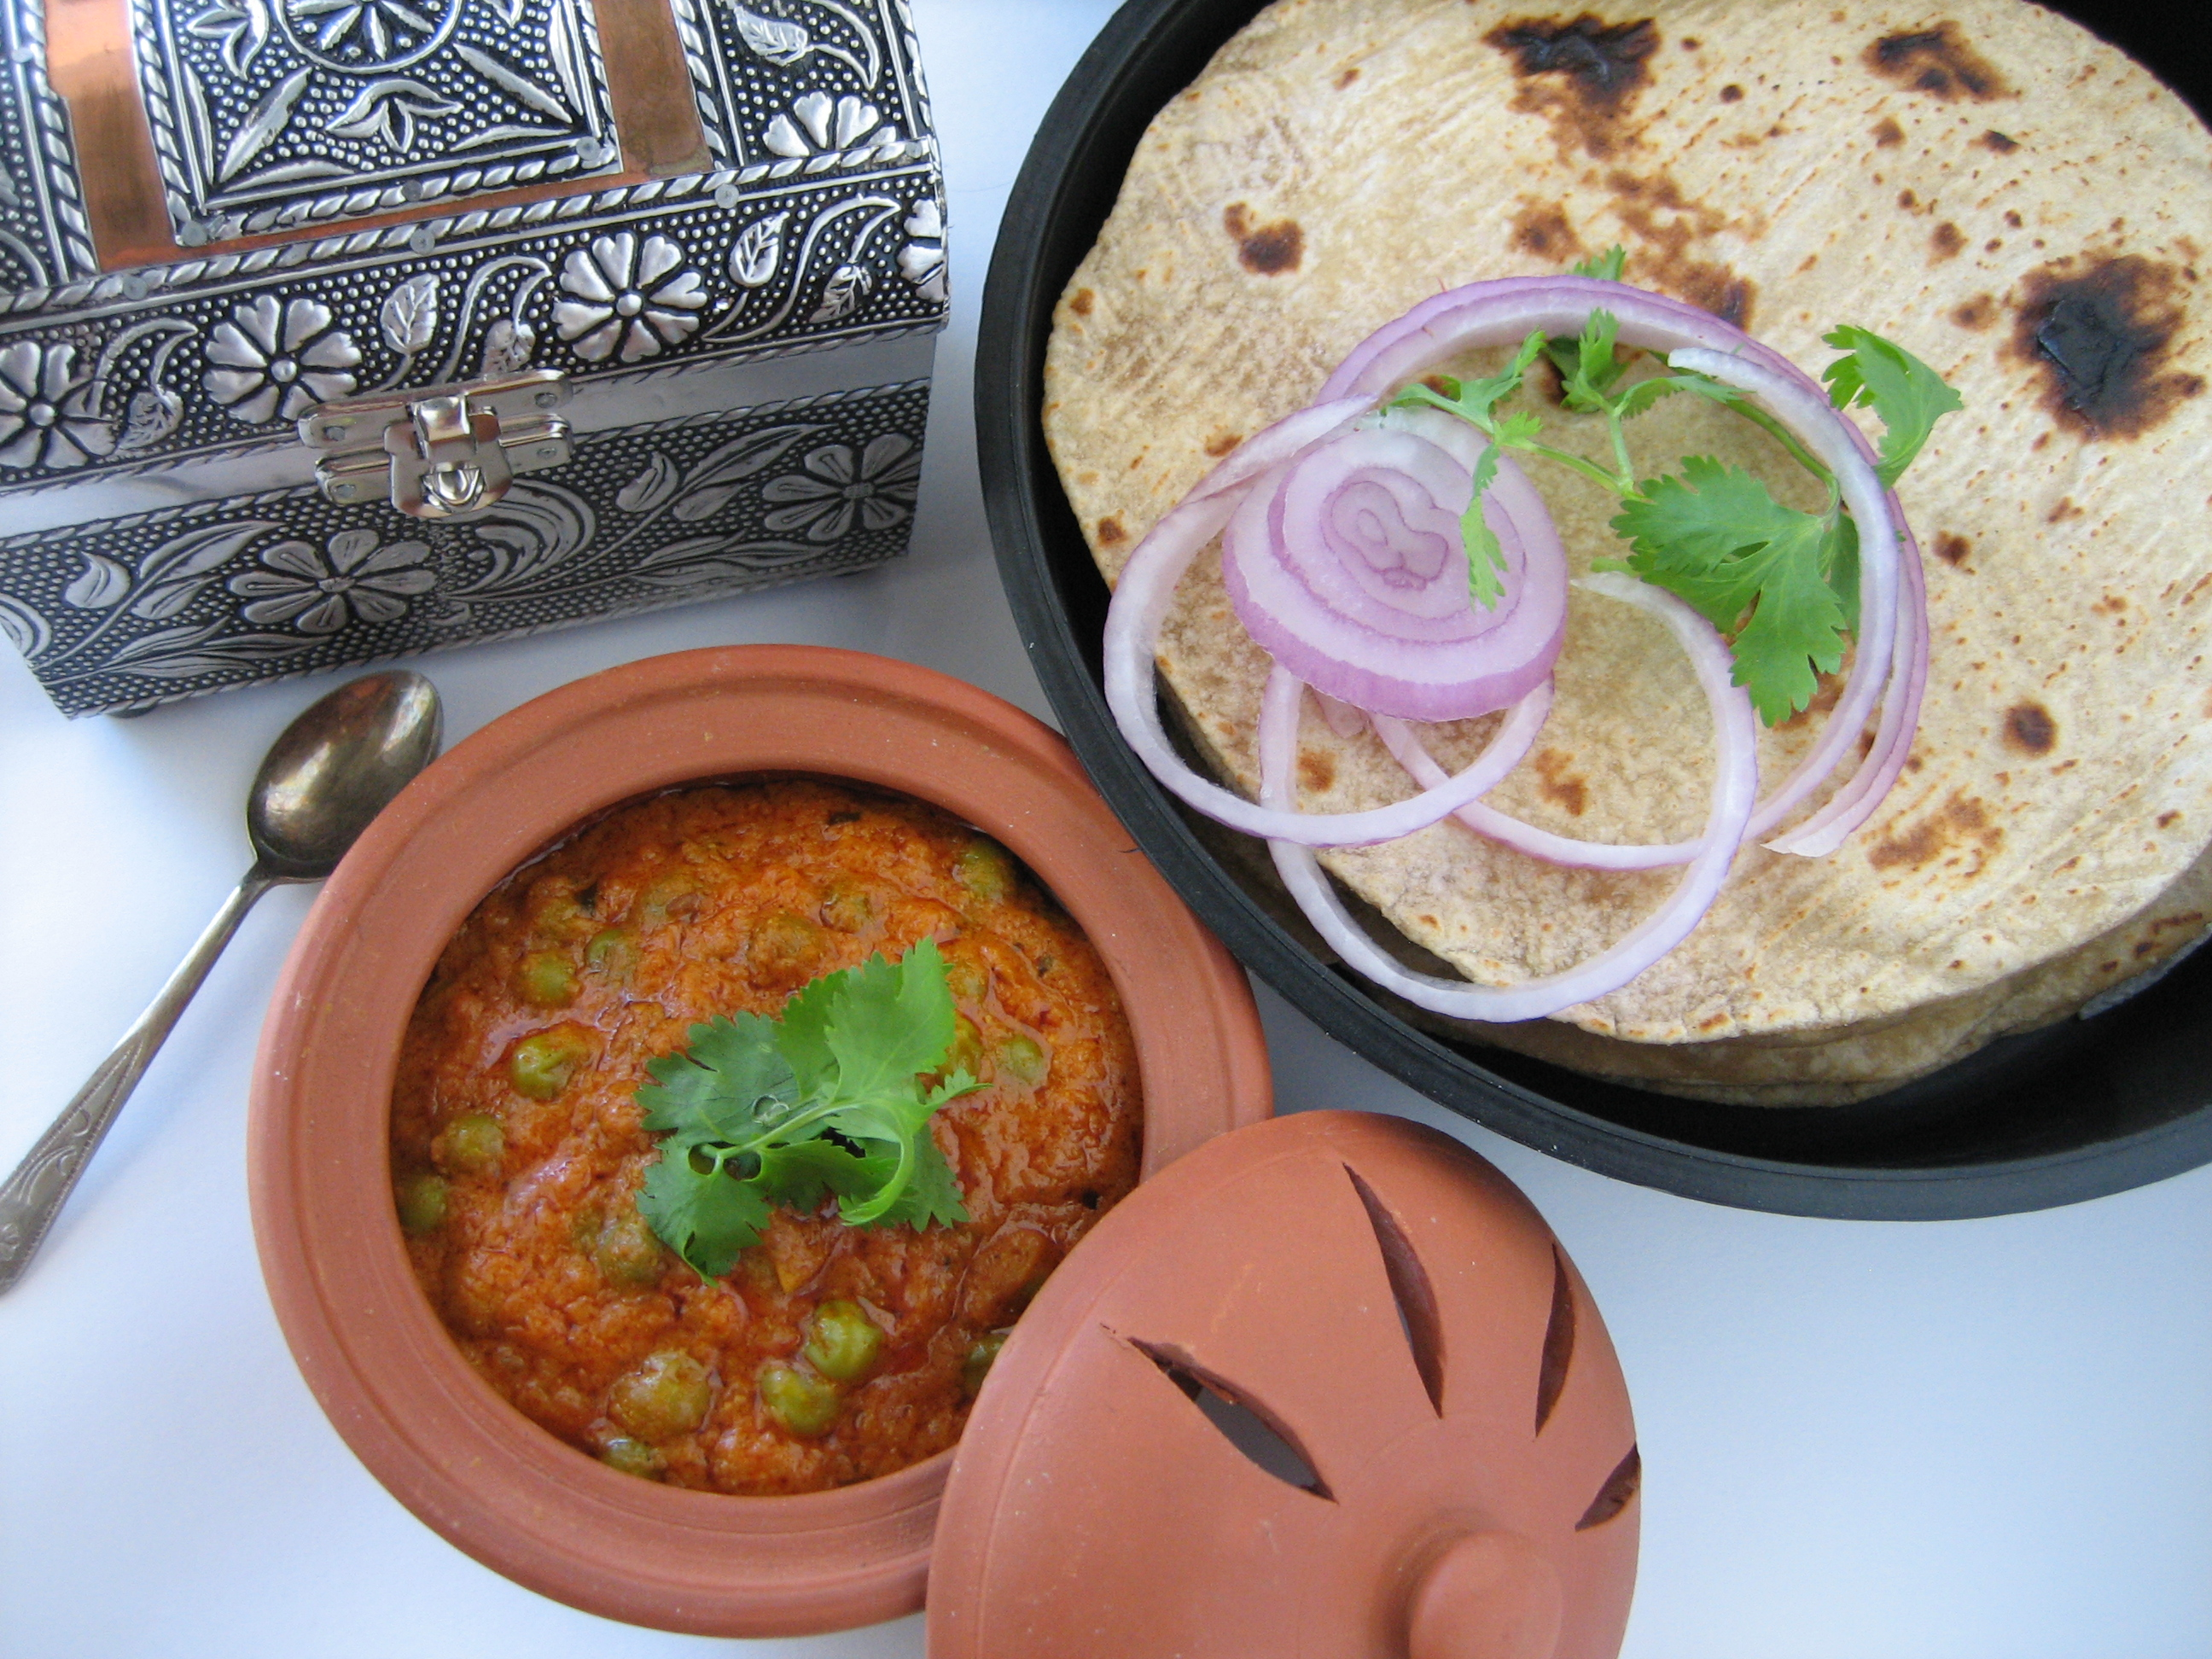 Green-Peas-Subzi-Dhaba-Style